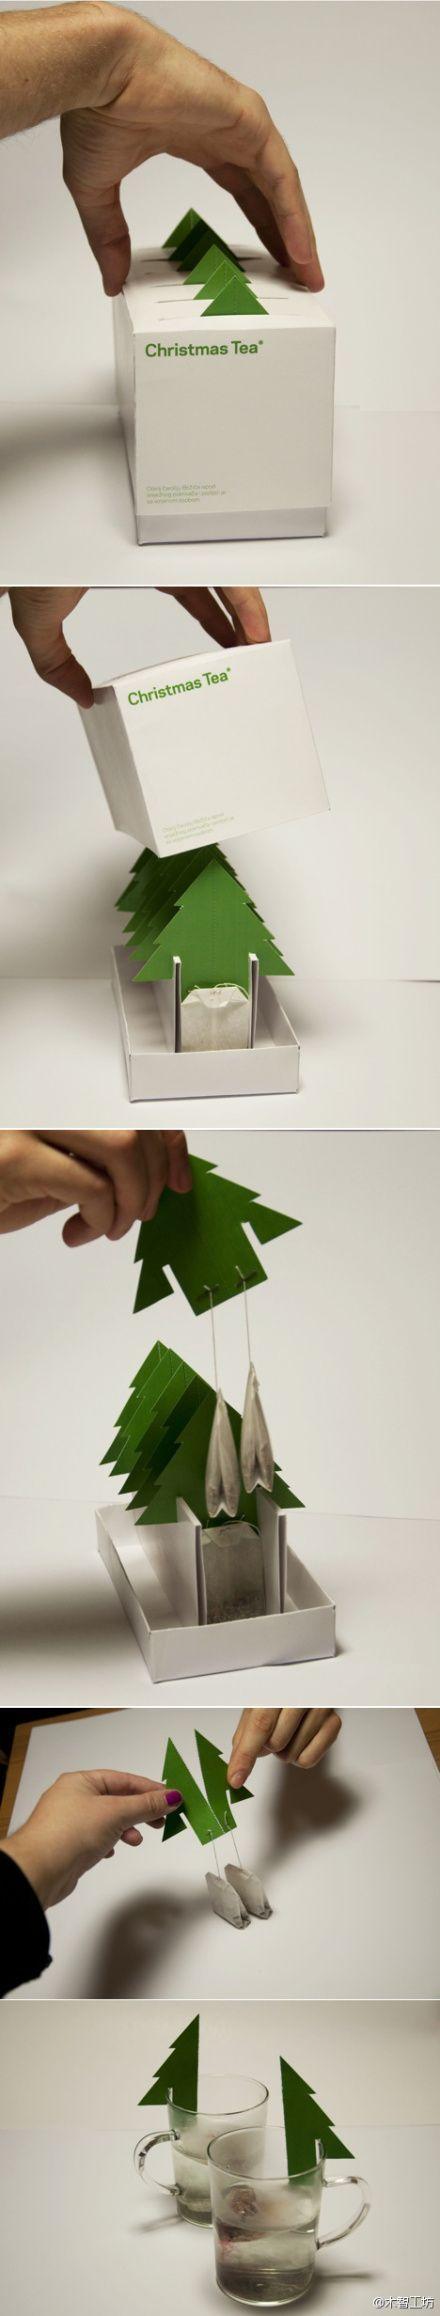 total süße Idee um Tee zu verschenken